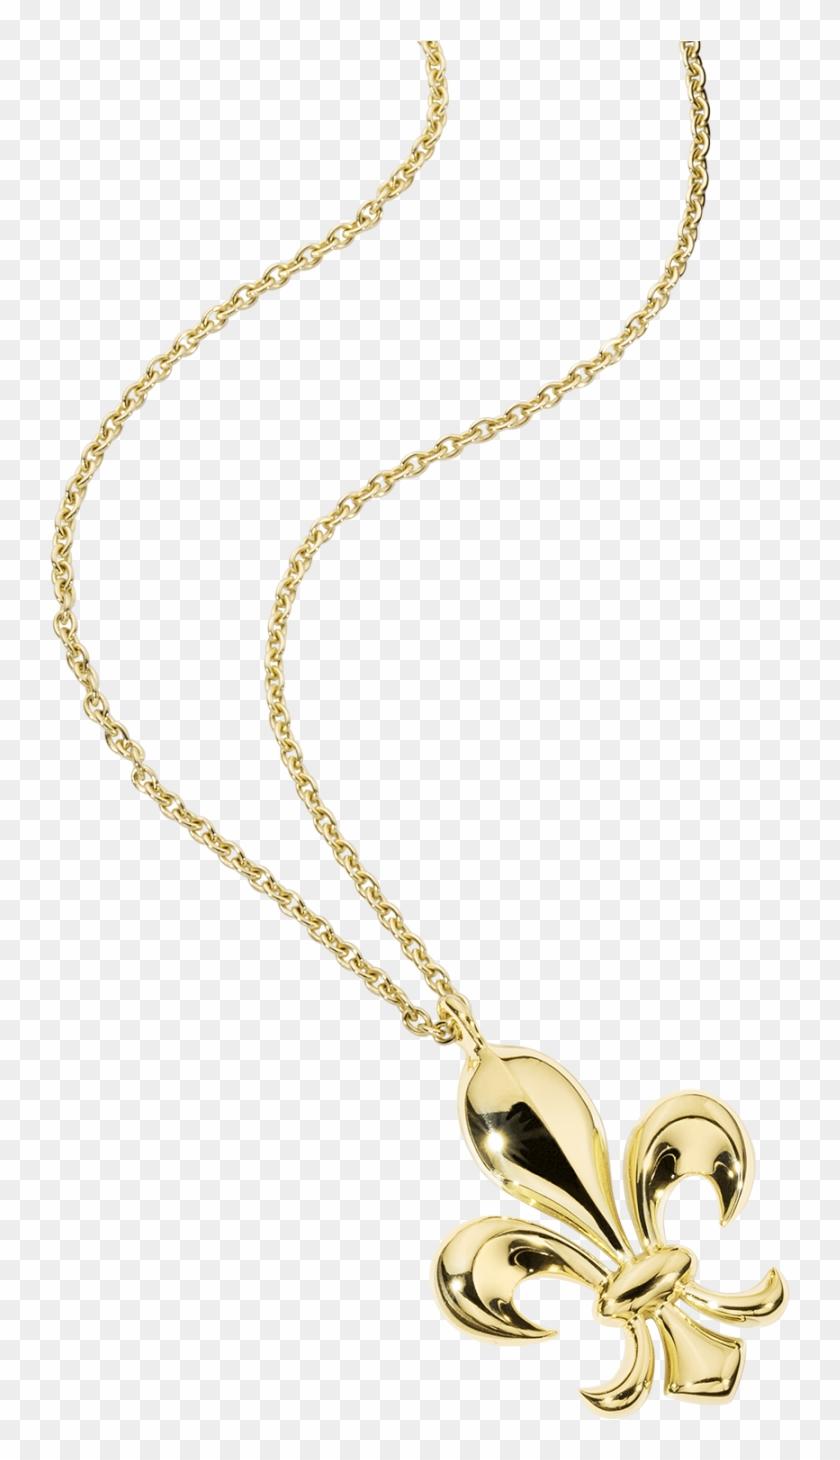 Lys Royal Pendant, Yellow Gold - Chaîne Fleur De Lys Clipart #3285407